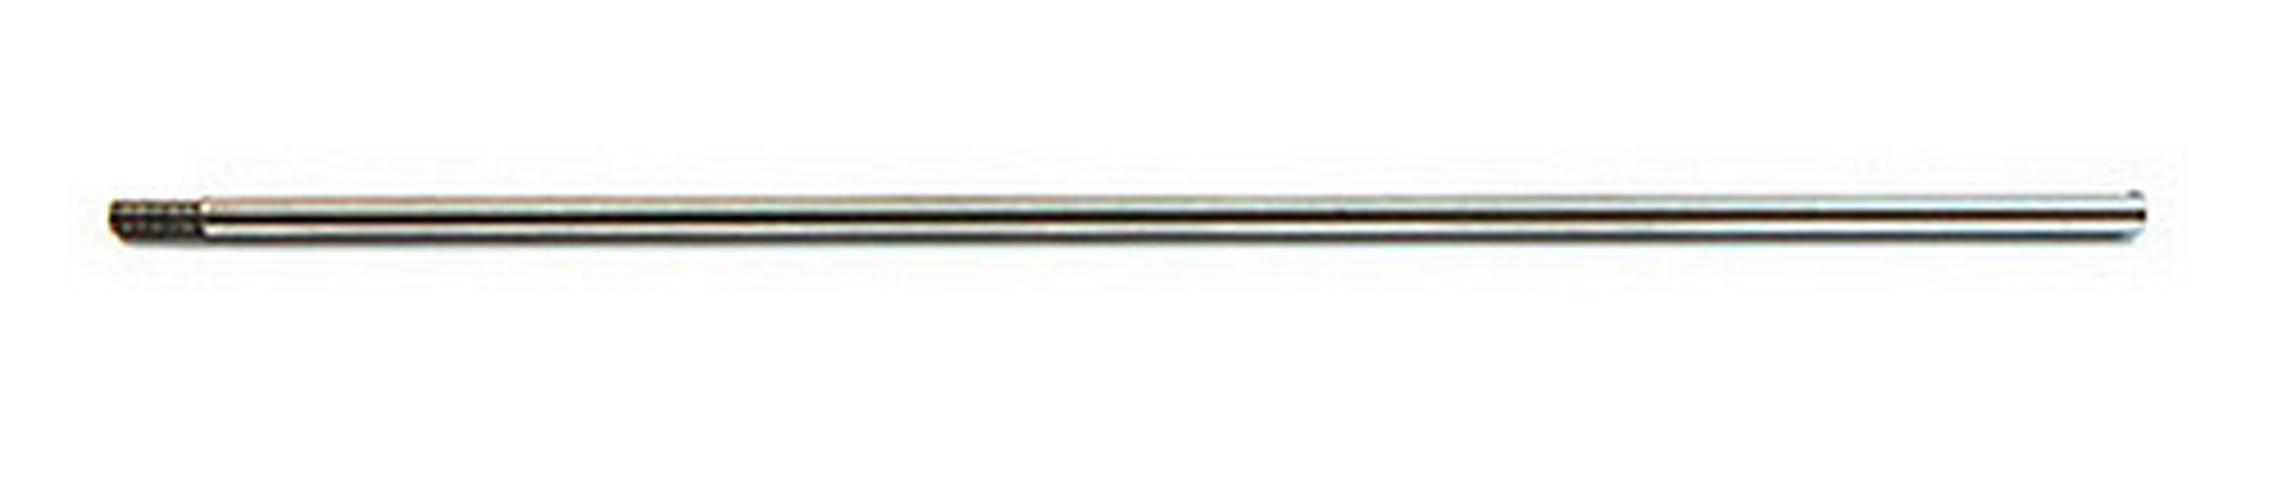 Rod Screw 2.8mm x 123.1mm - Left Hand